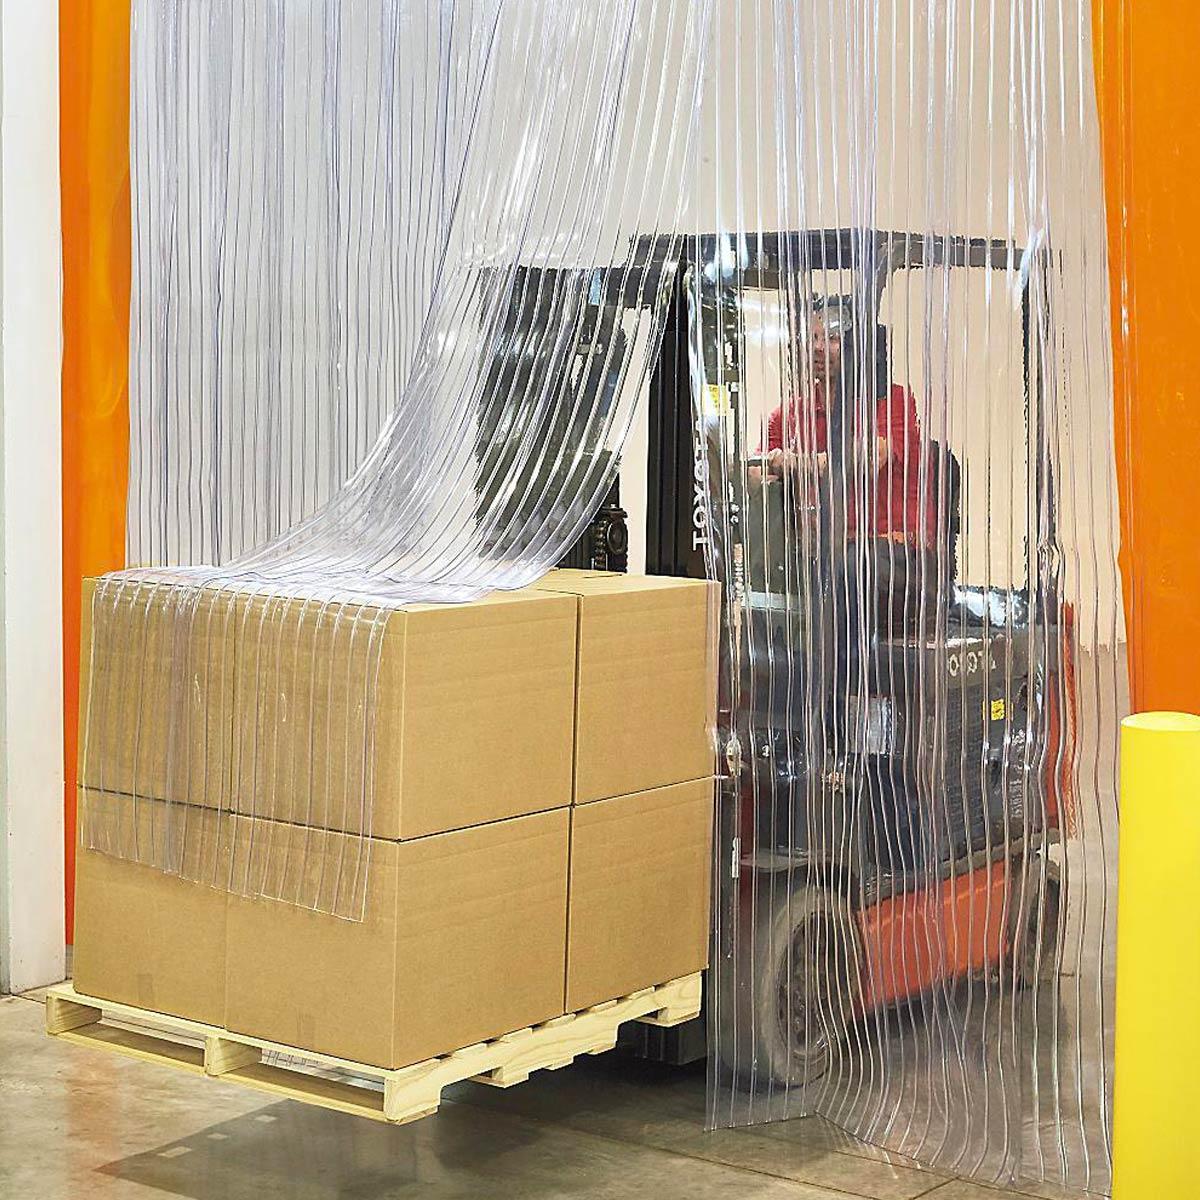 Clear vinyl door strip curtains at Lustercraft